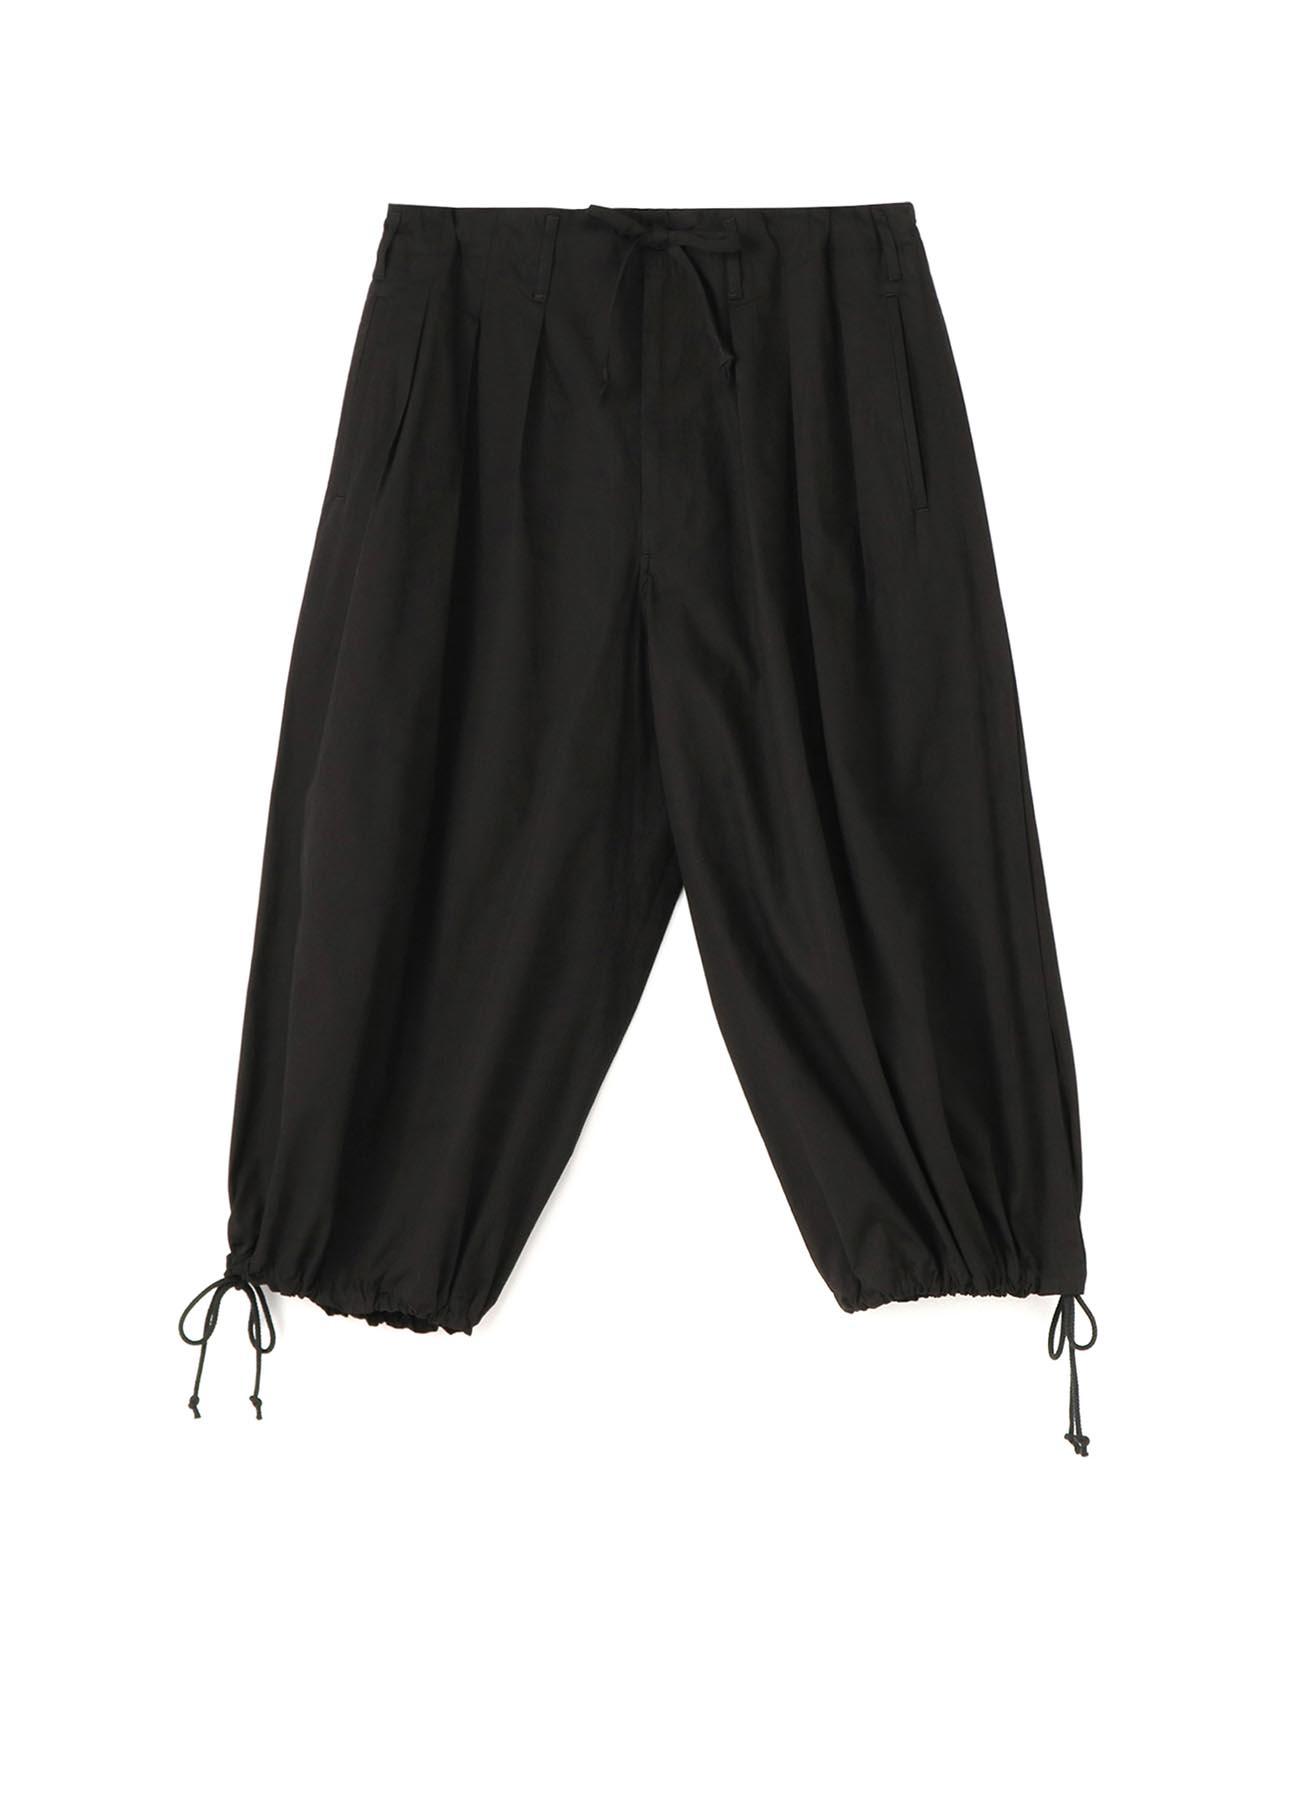 40/2 Cotton Broad Balloon Pants